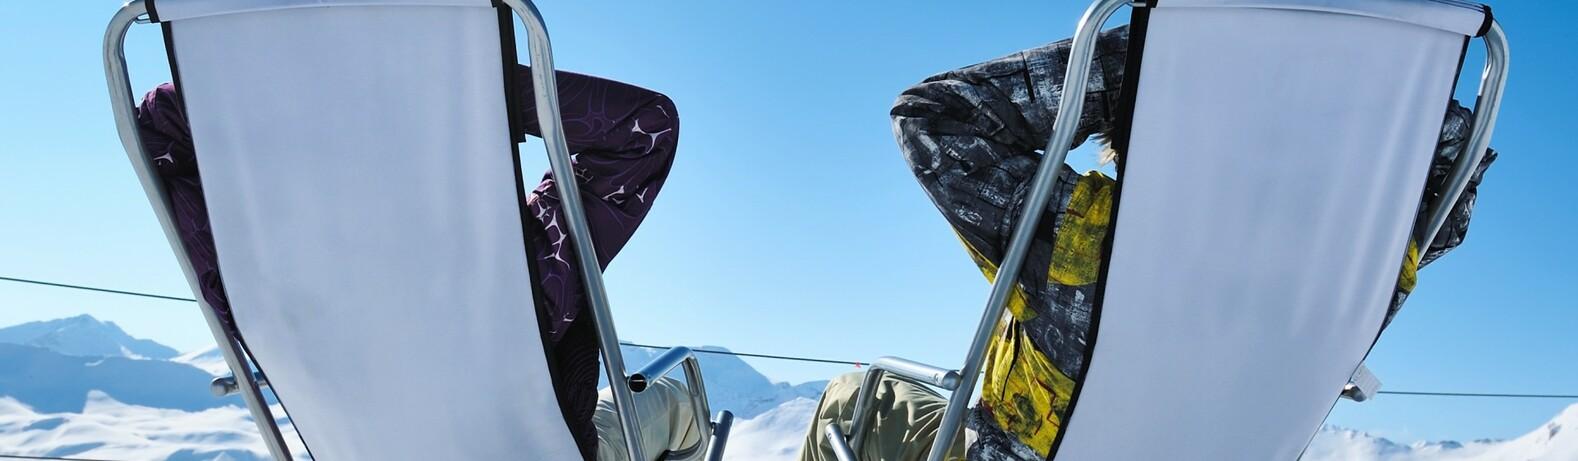 Skijanje Vars